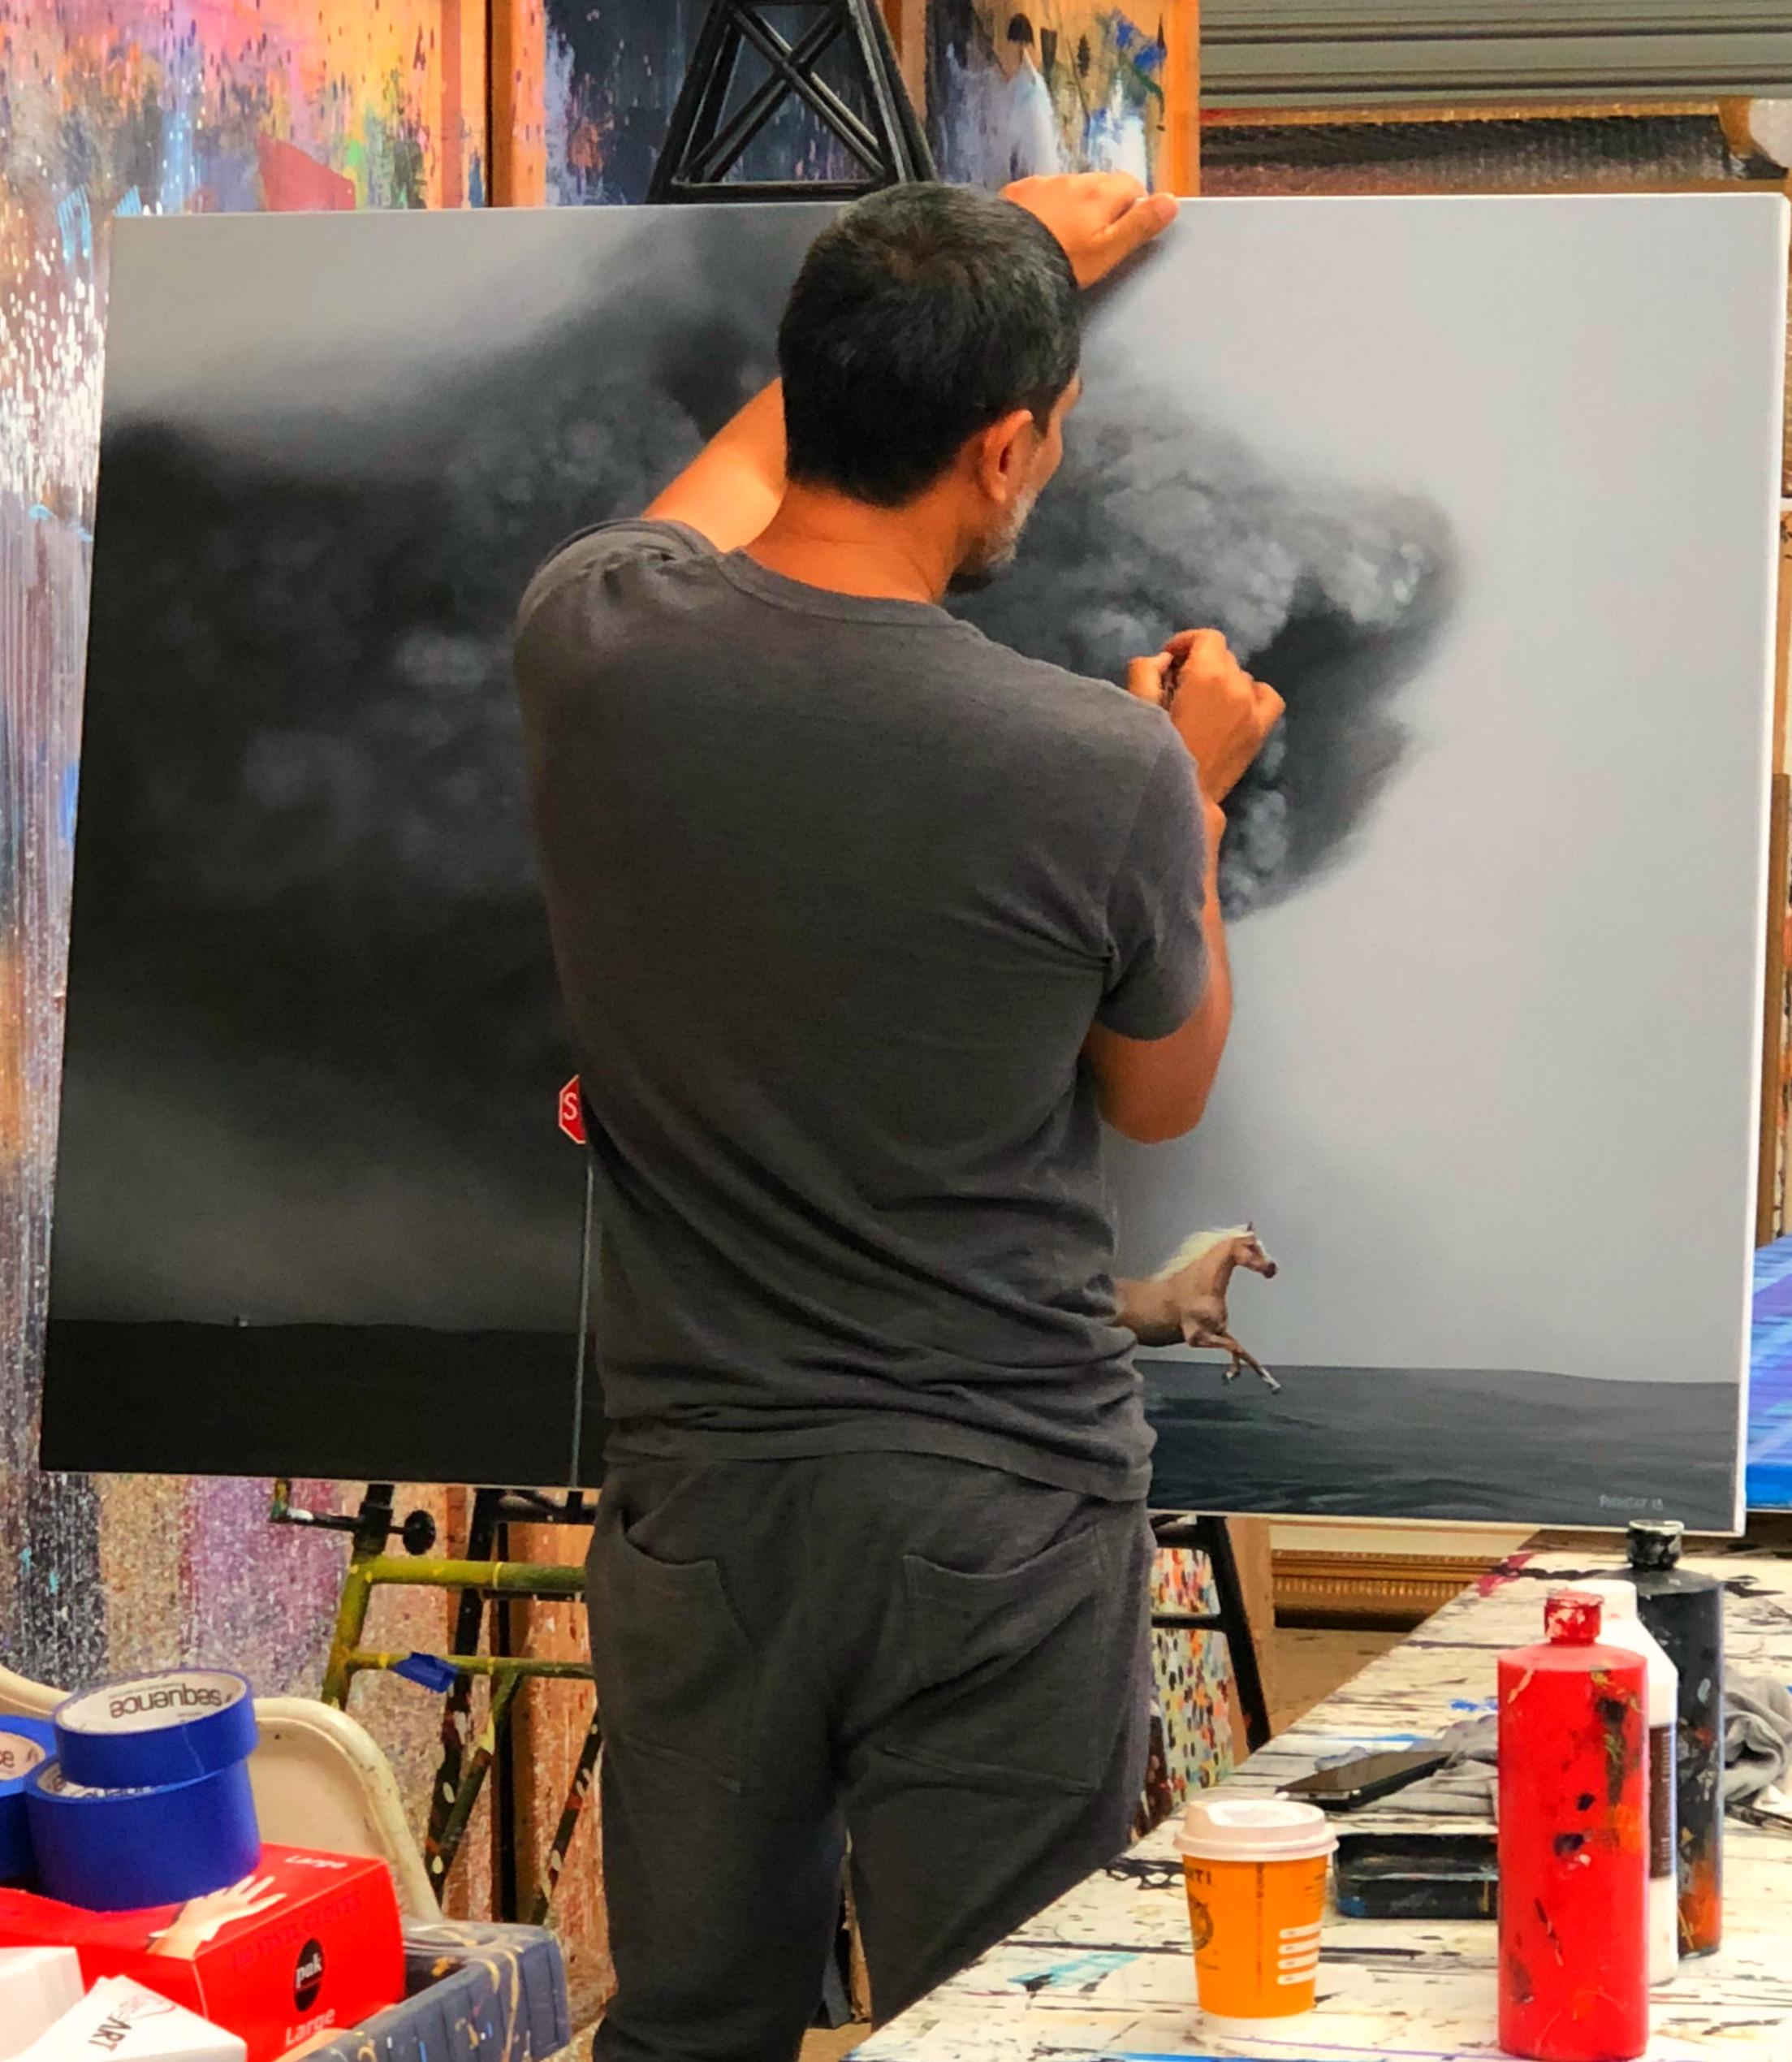 Above: Hyper-realism artist, Phonsay painting in his Albury-based studio.